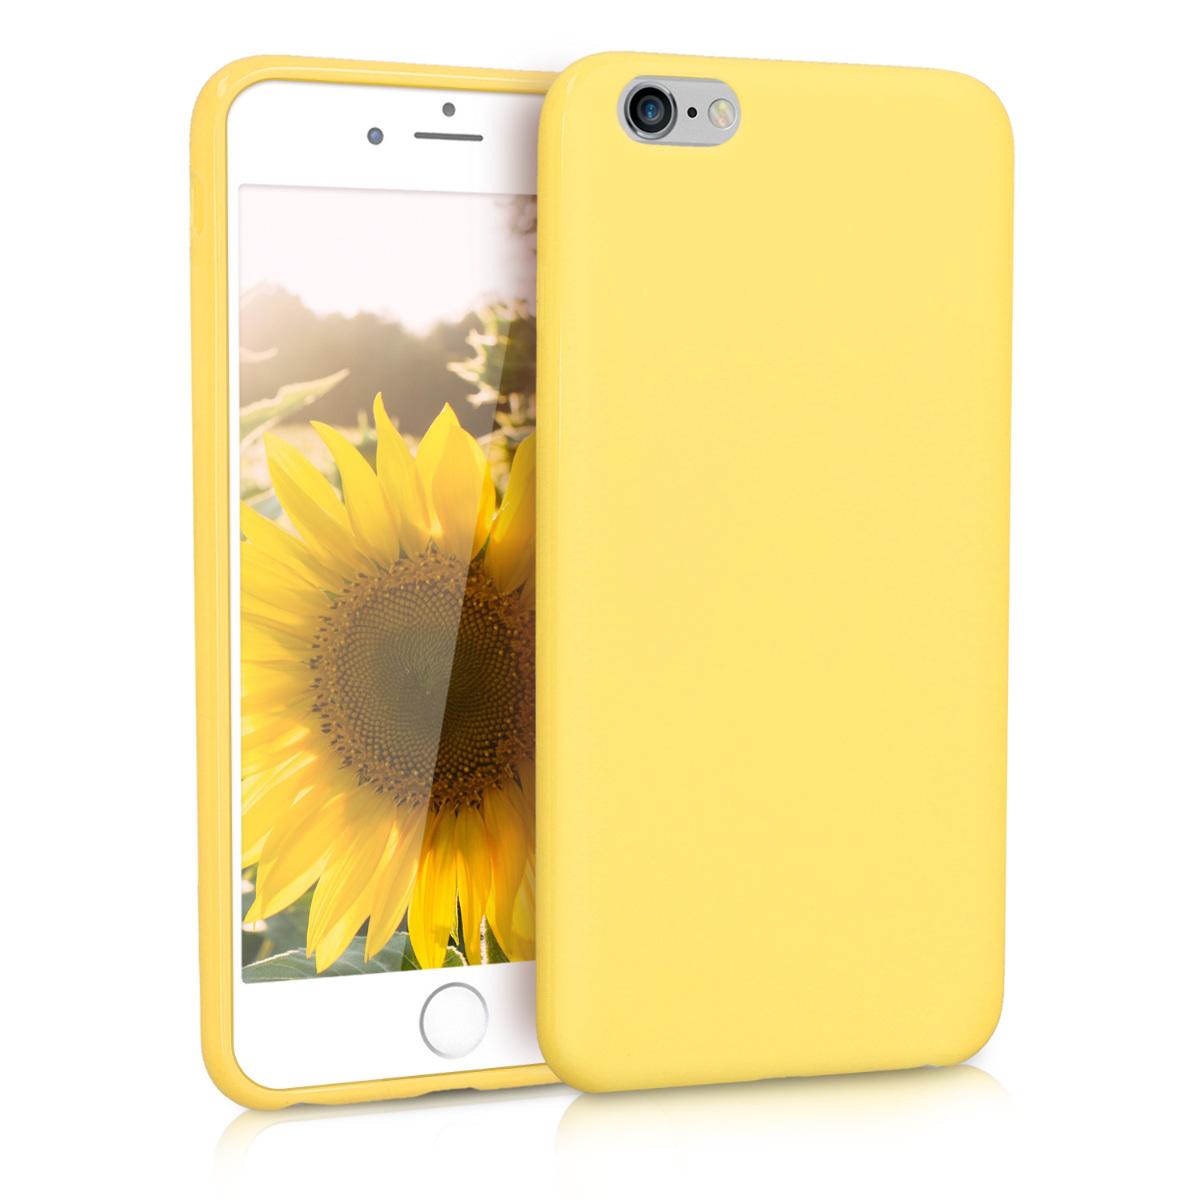 KW Soft Flexible Rubber Θήκη Σιλικόνης iPhone 6 Plus / 6S Plus - Pastel Yellow Matte (37726.119)